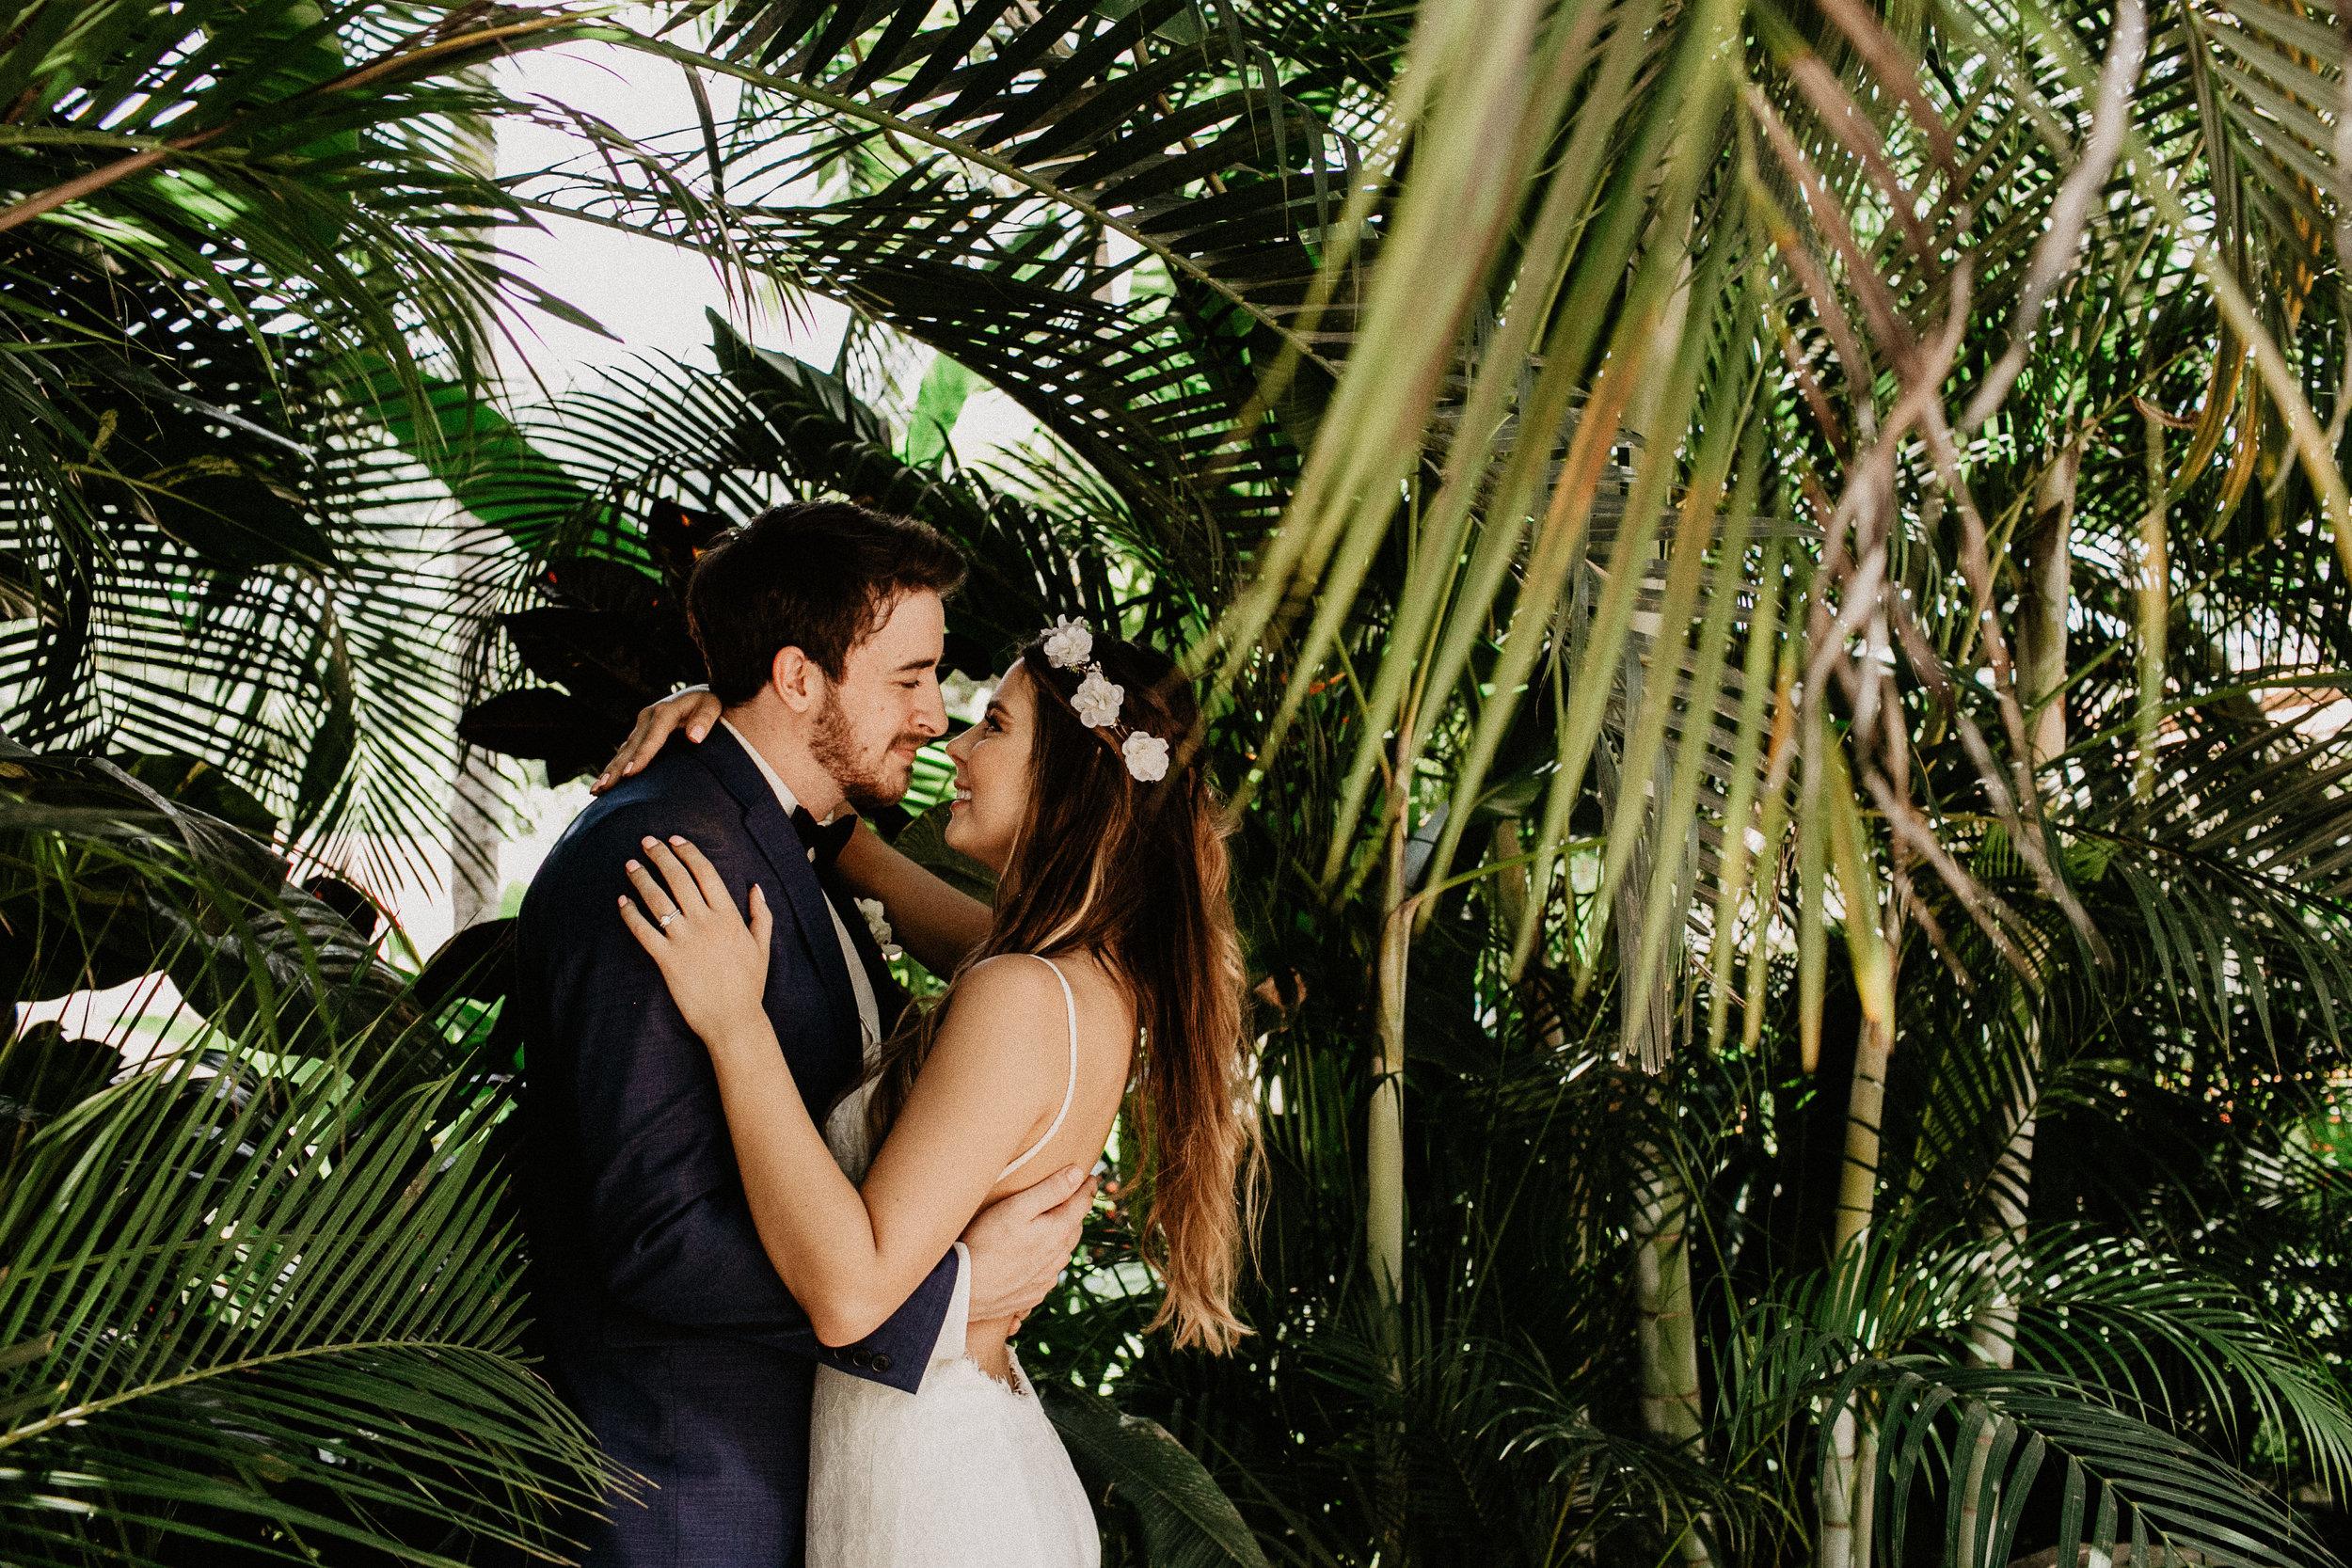 alfonso_flores_destination_wedding_photography_puerto_vallarta_hotel_barcelo_vallarta_cuttler_amela-307.JPG